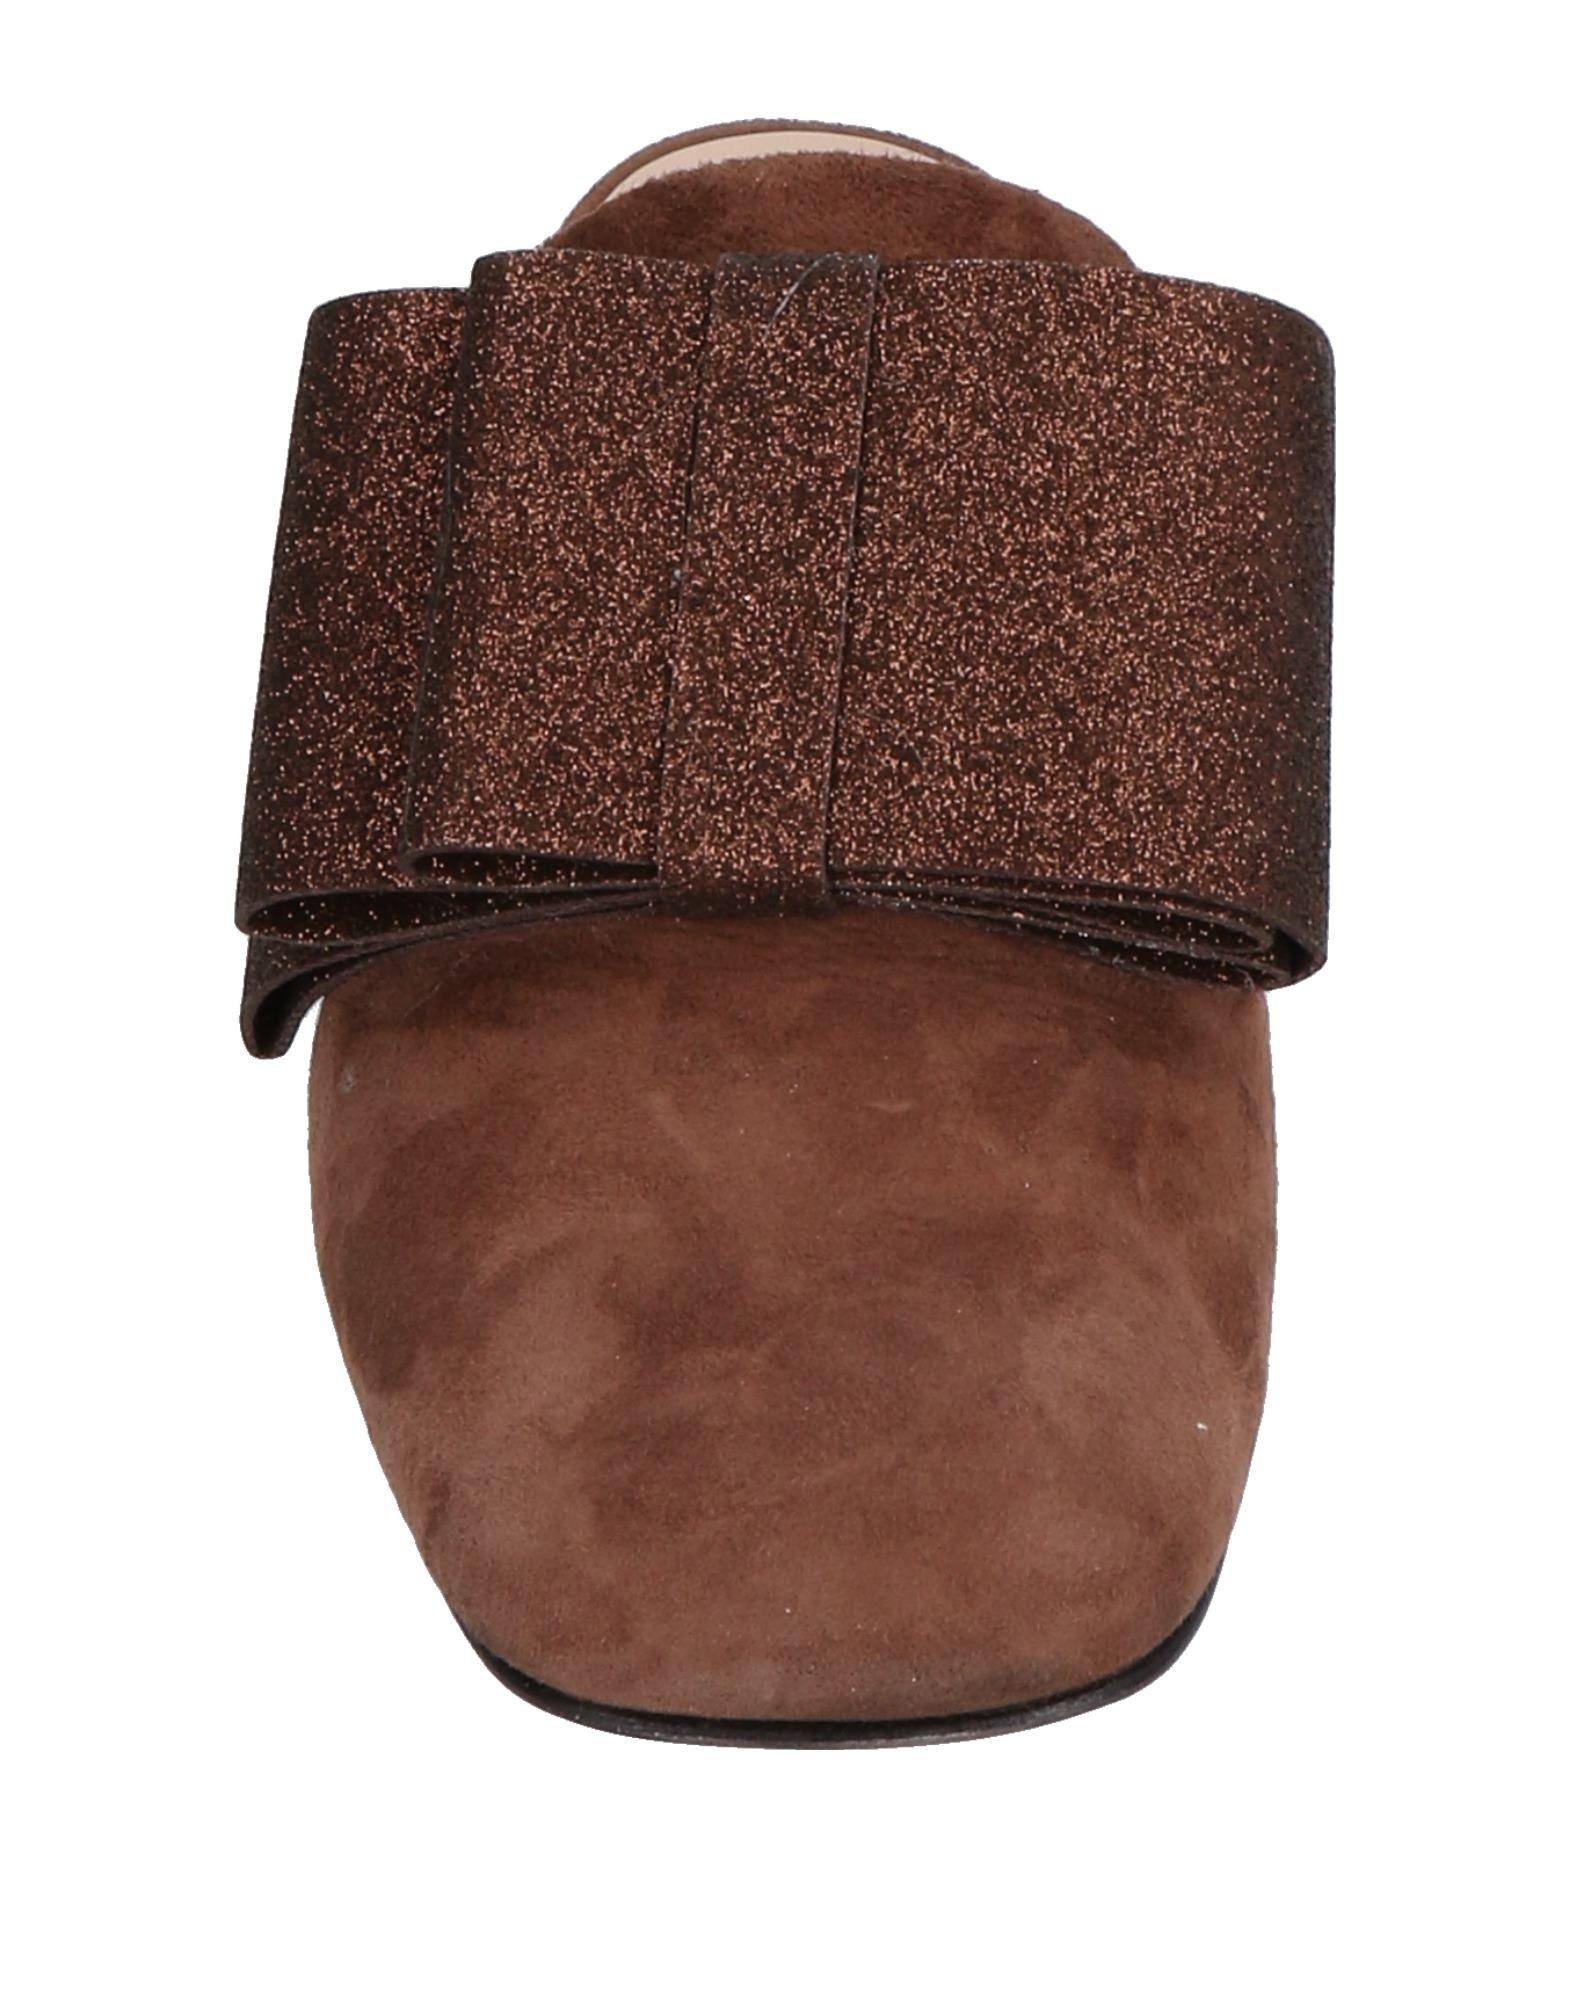 Tipe E Tacchi Pantoletten Damen  11487292IP Gute Qualität beliebte Schuhe